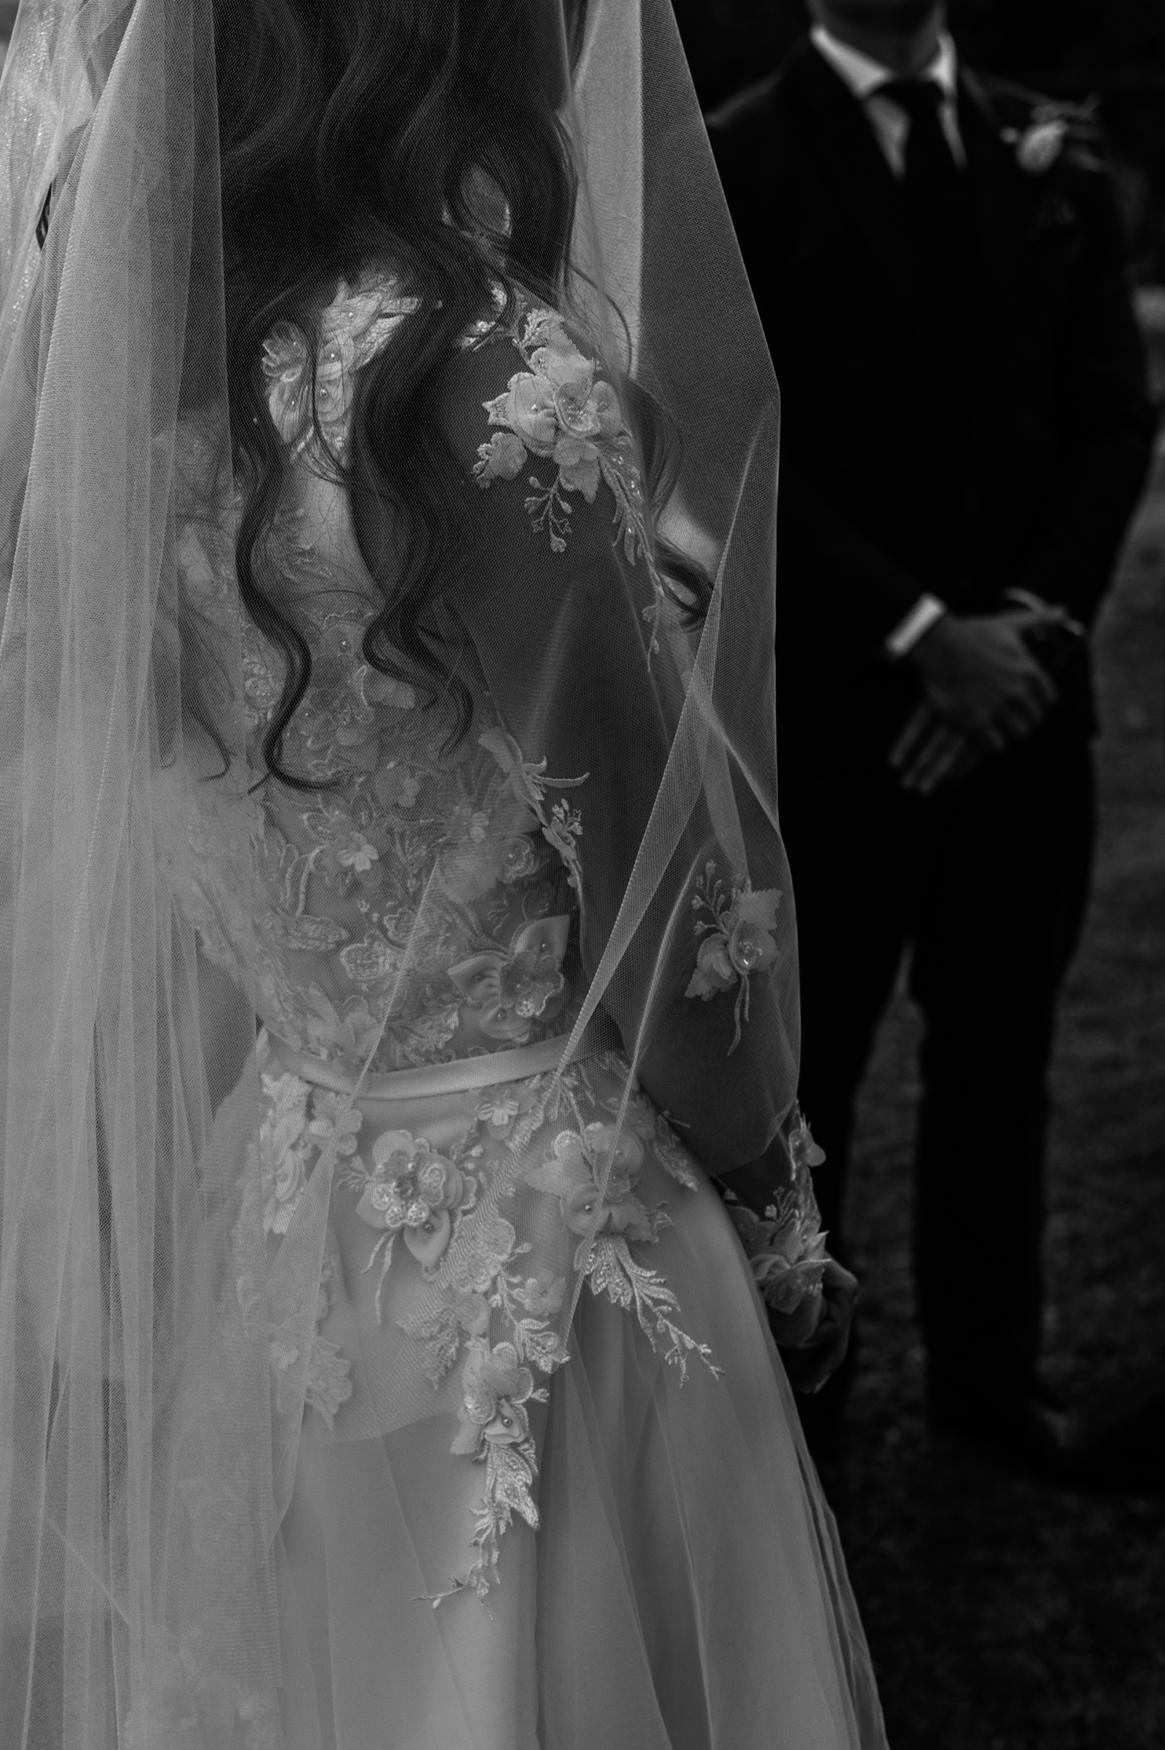 Leon_&_Martine's_Wedding_Photographs_17th_April_2019_@johnhenryweddingphoto_Low_Resolution_Web-324.JPG